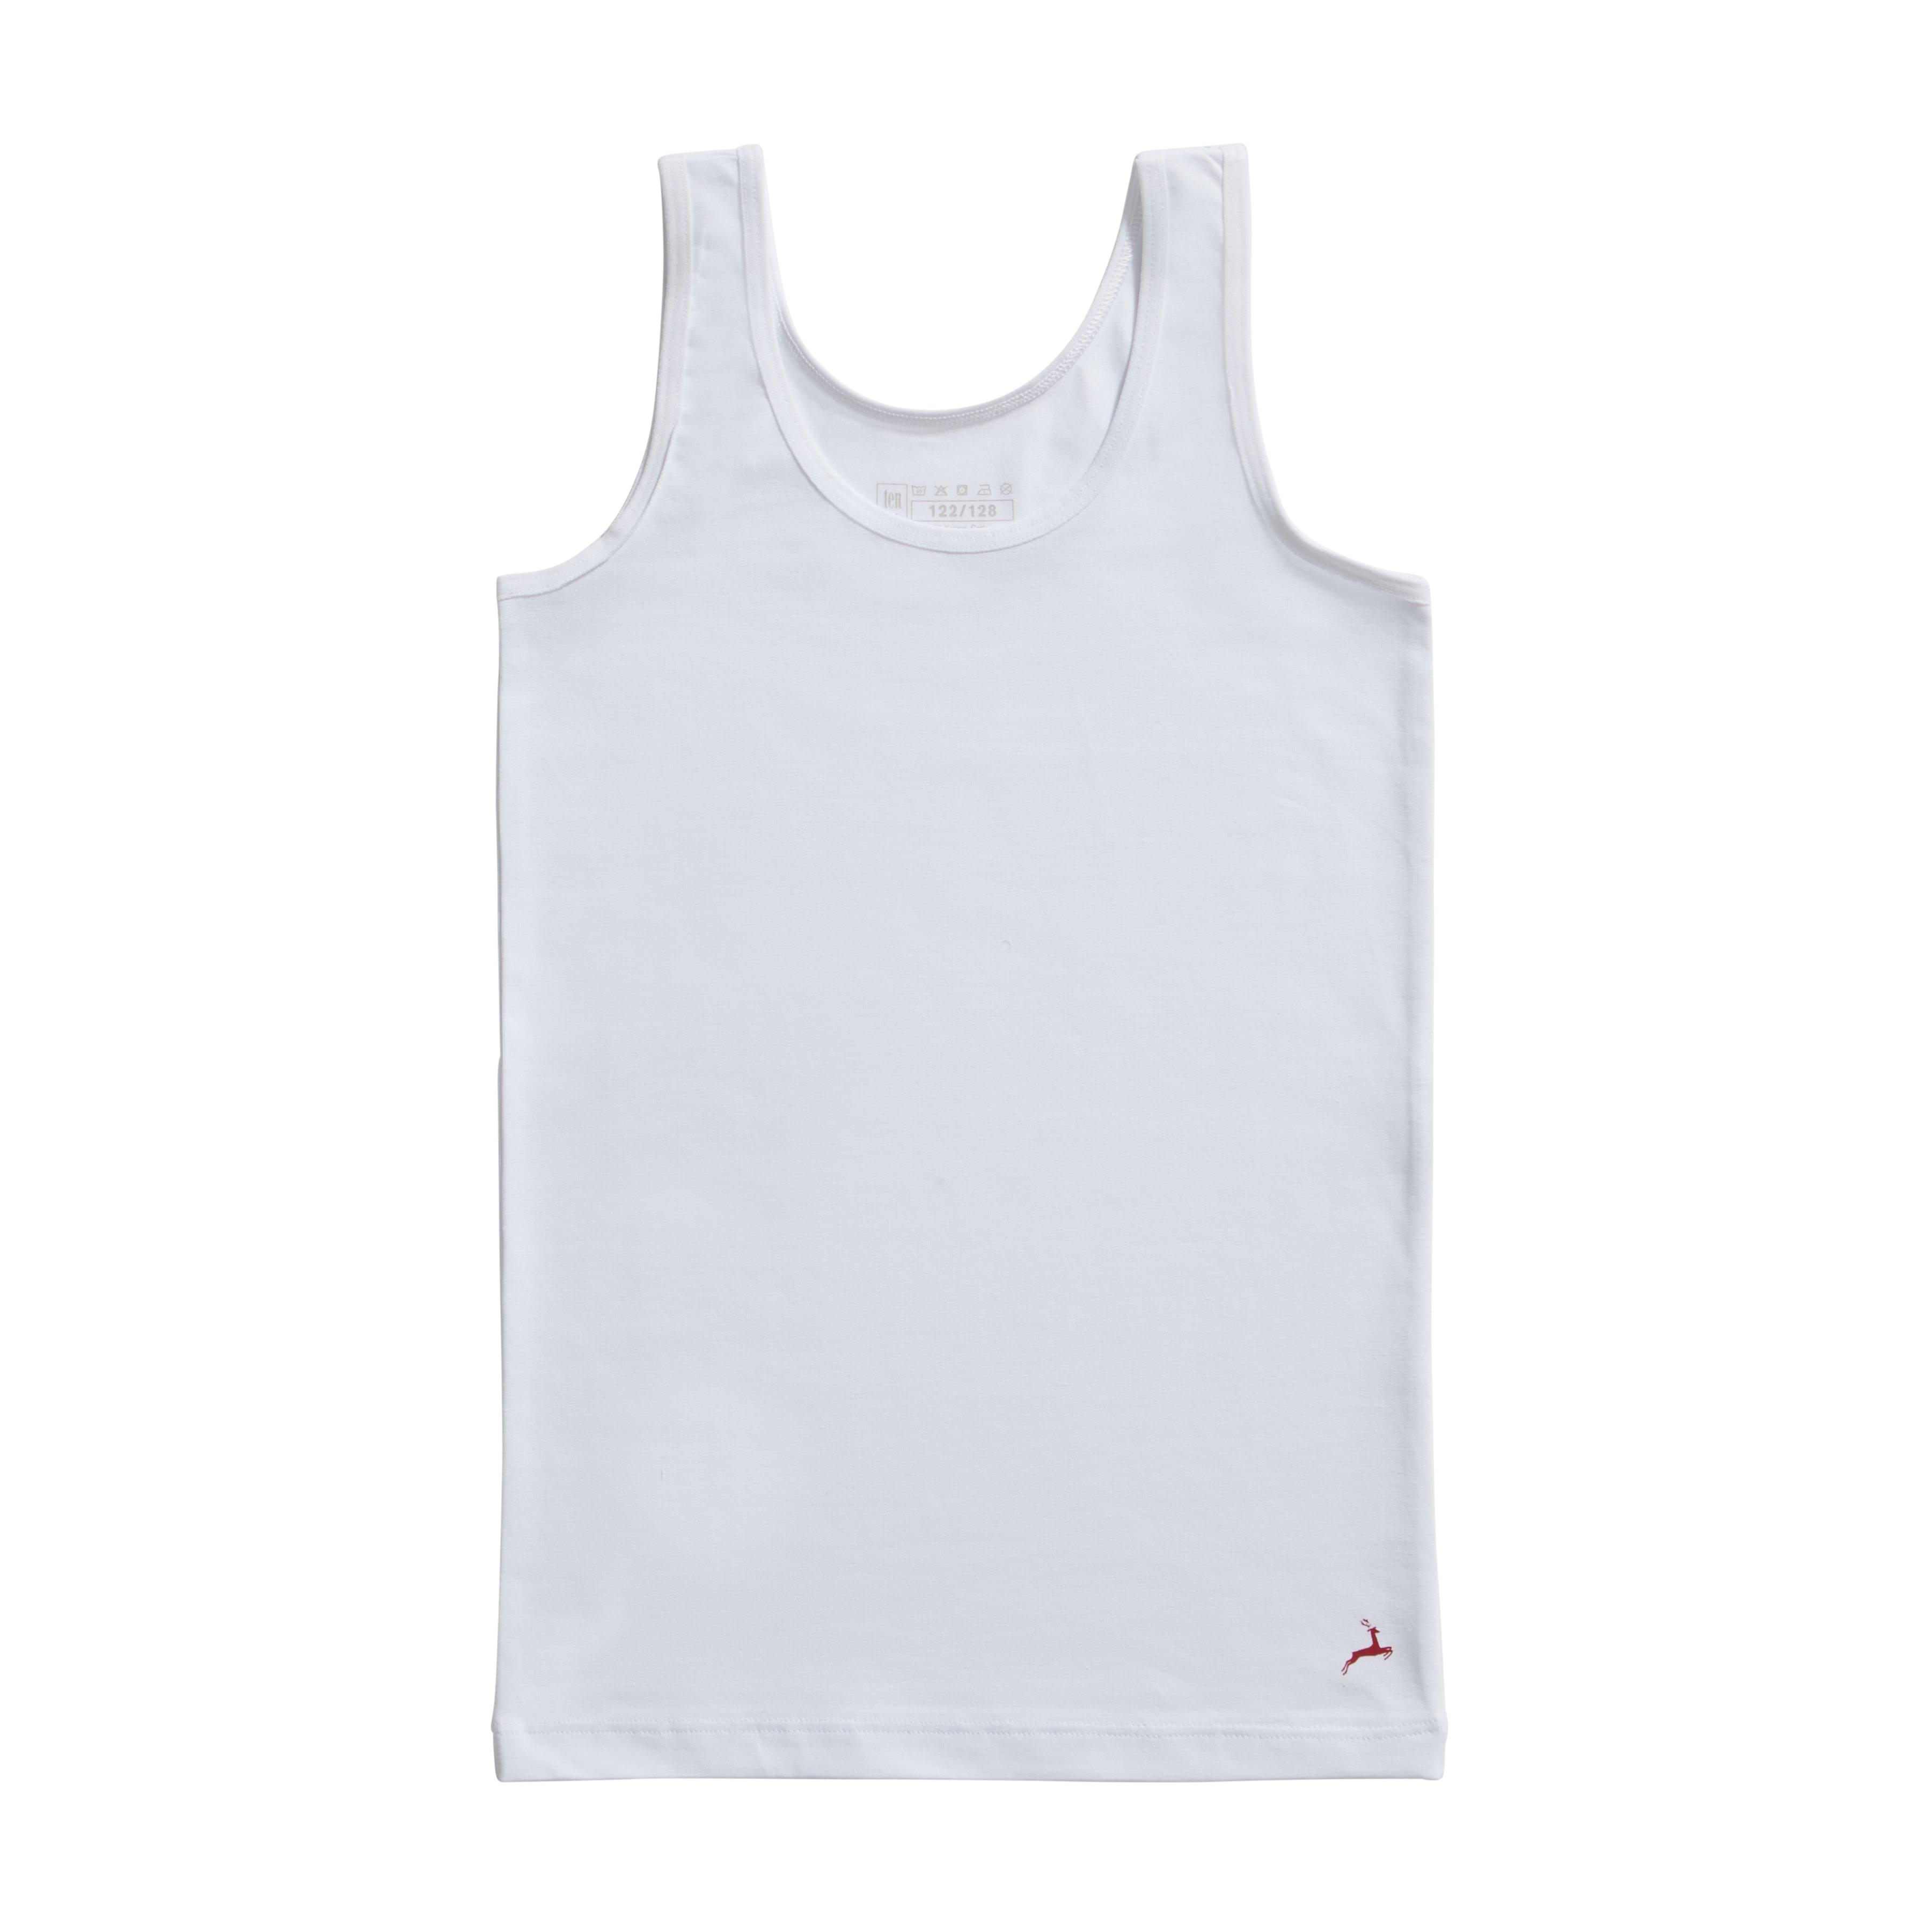 Ten Cate Kids Girls Shirt white